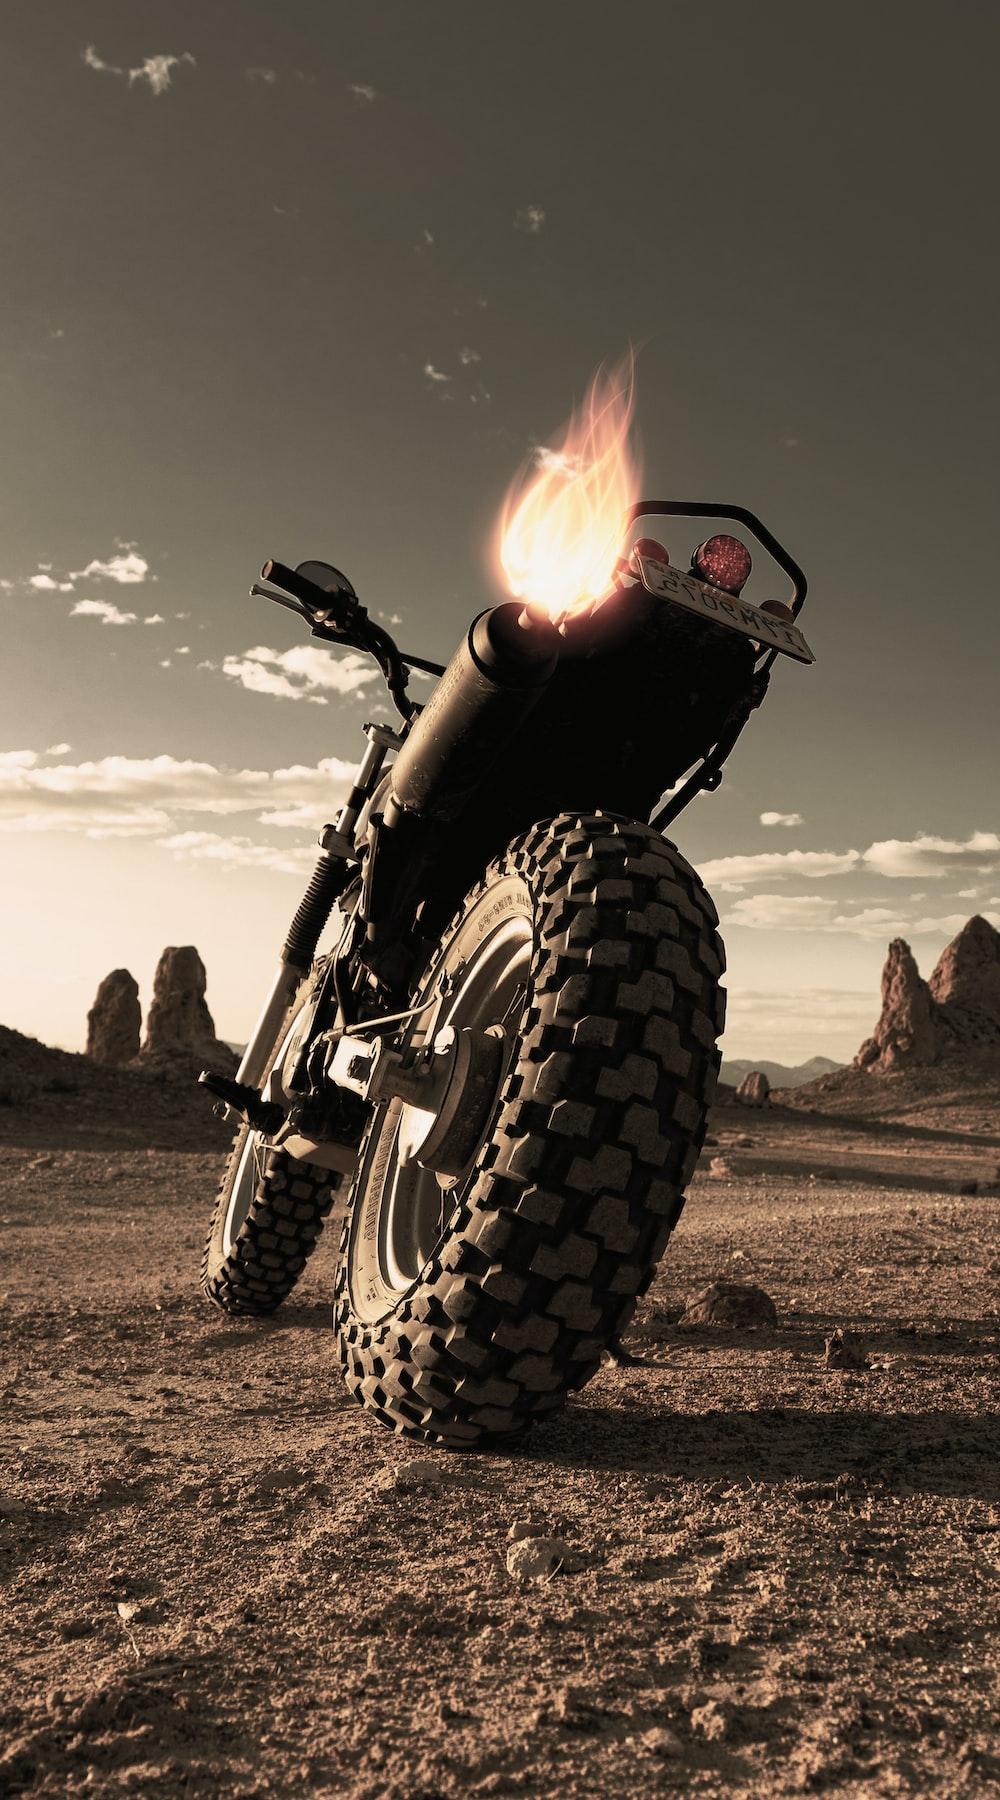 black motorcycle on brown field during daytime